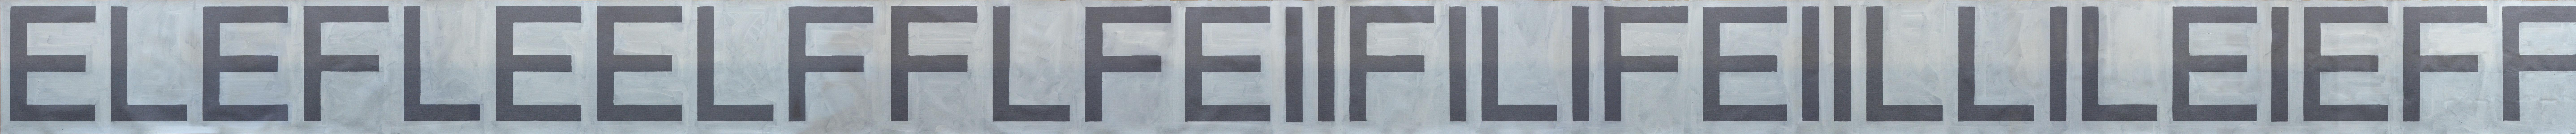 EFIL painting infinite.